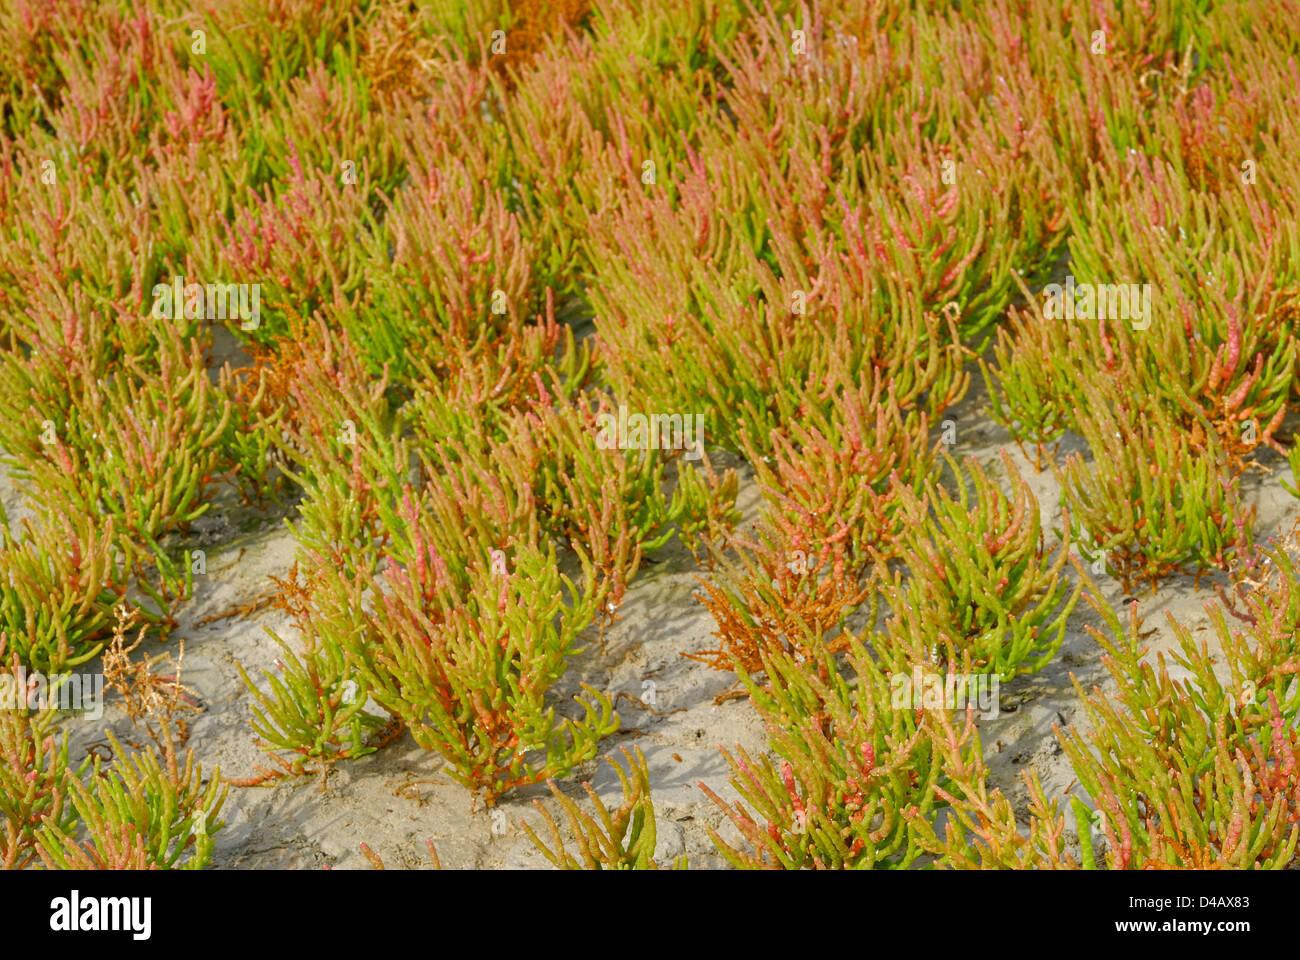 Perennial saltwort, Salicornia fruticosa, Chenopodiaceae, Putzu Idu pond, Sinis, Sardinia, Italy - Stock Image